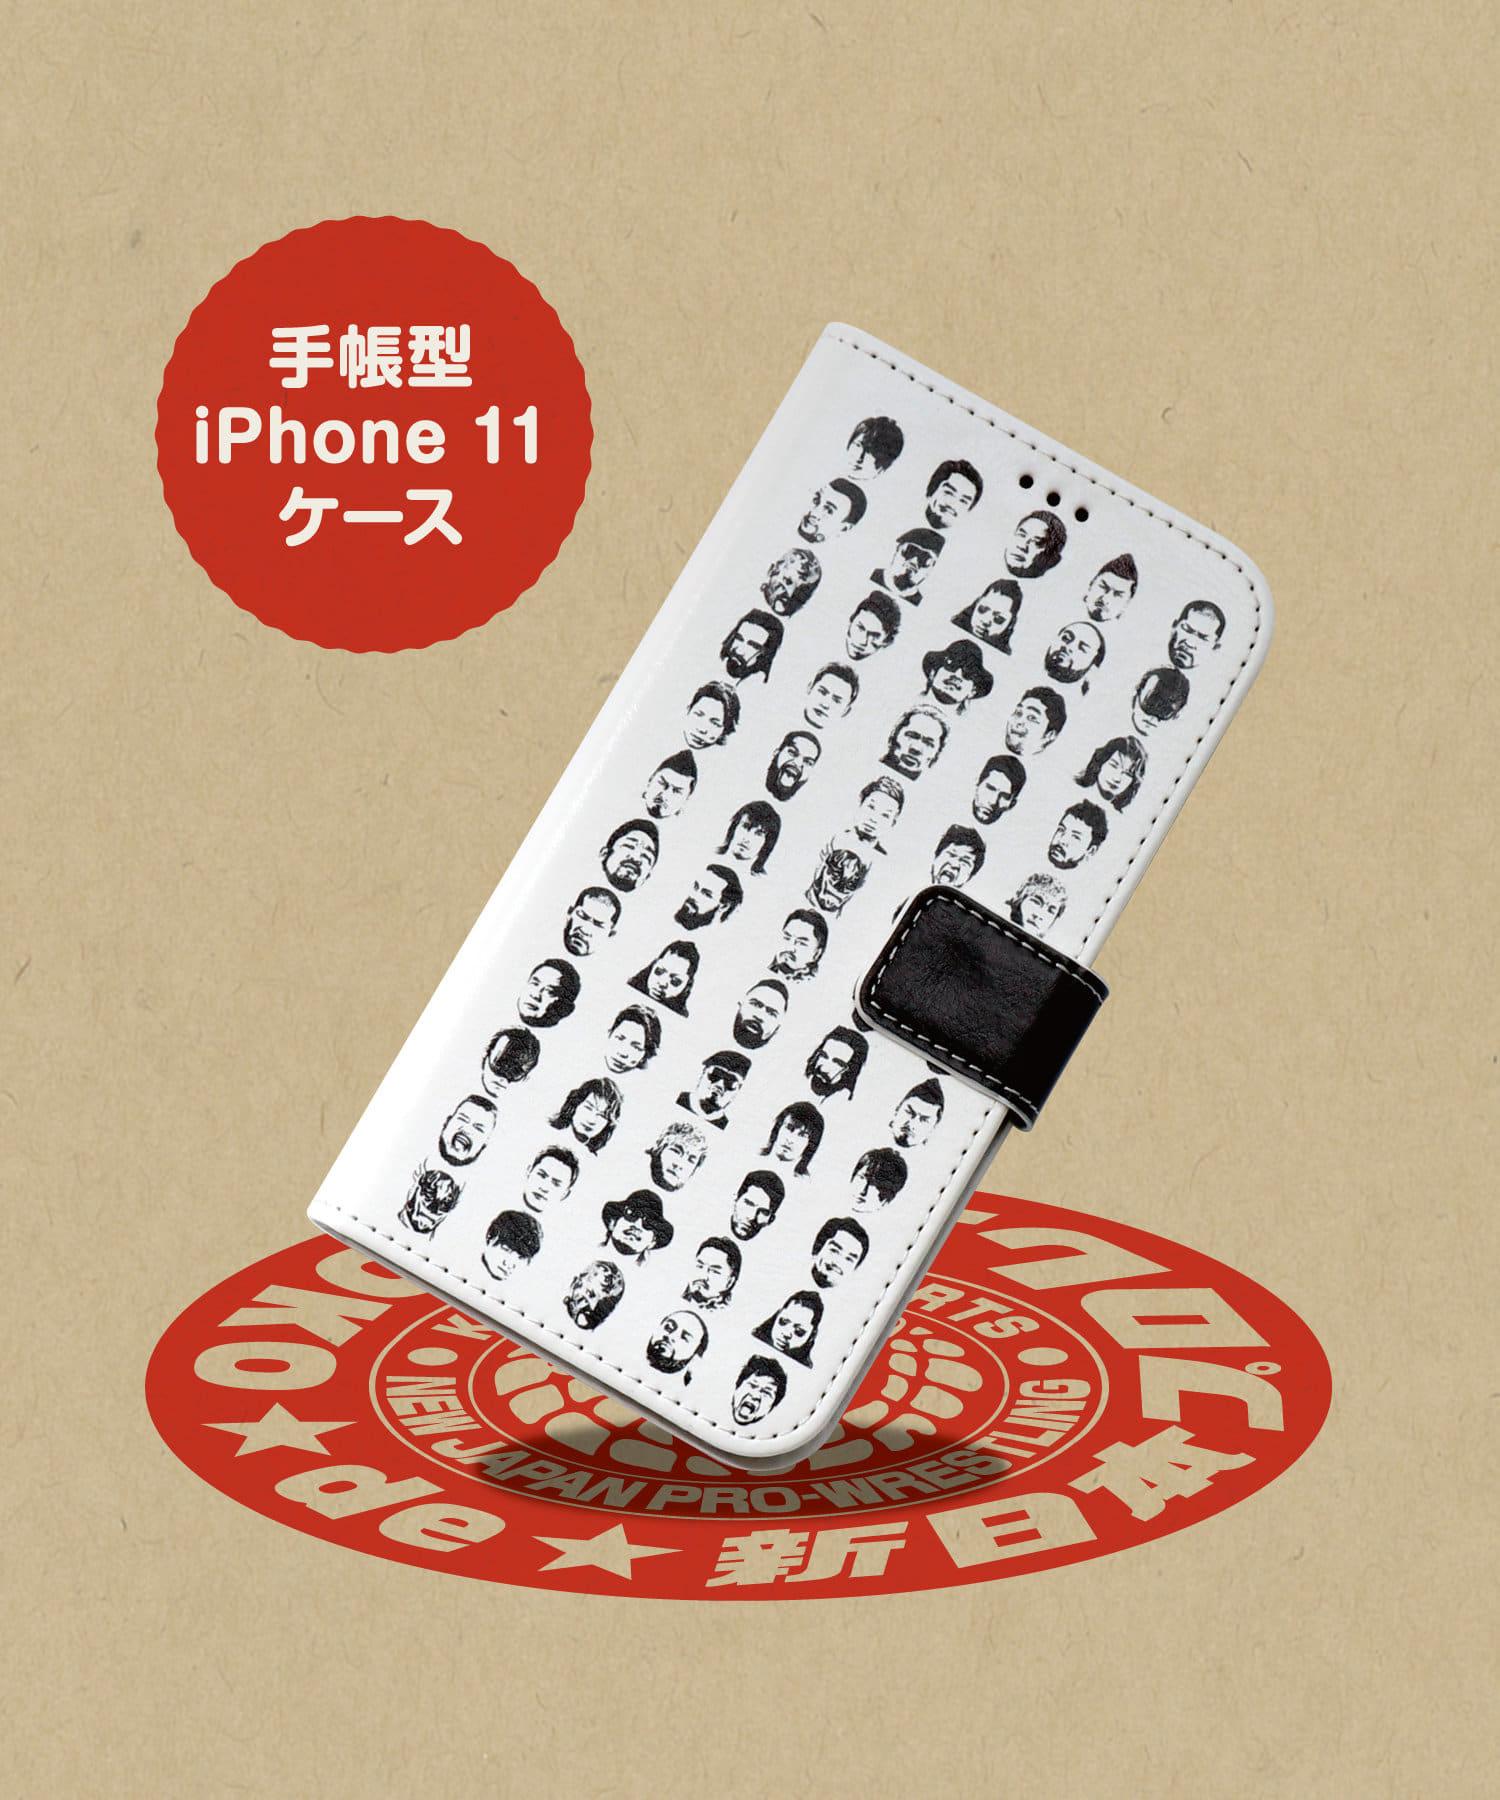 ASOKO(アソコ) ライフスタイル 【ASOKO de 新日本プロレス】手帳型iPhone11ケース その他